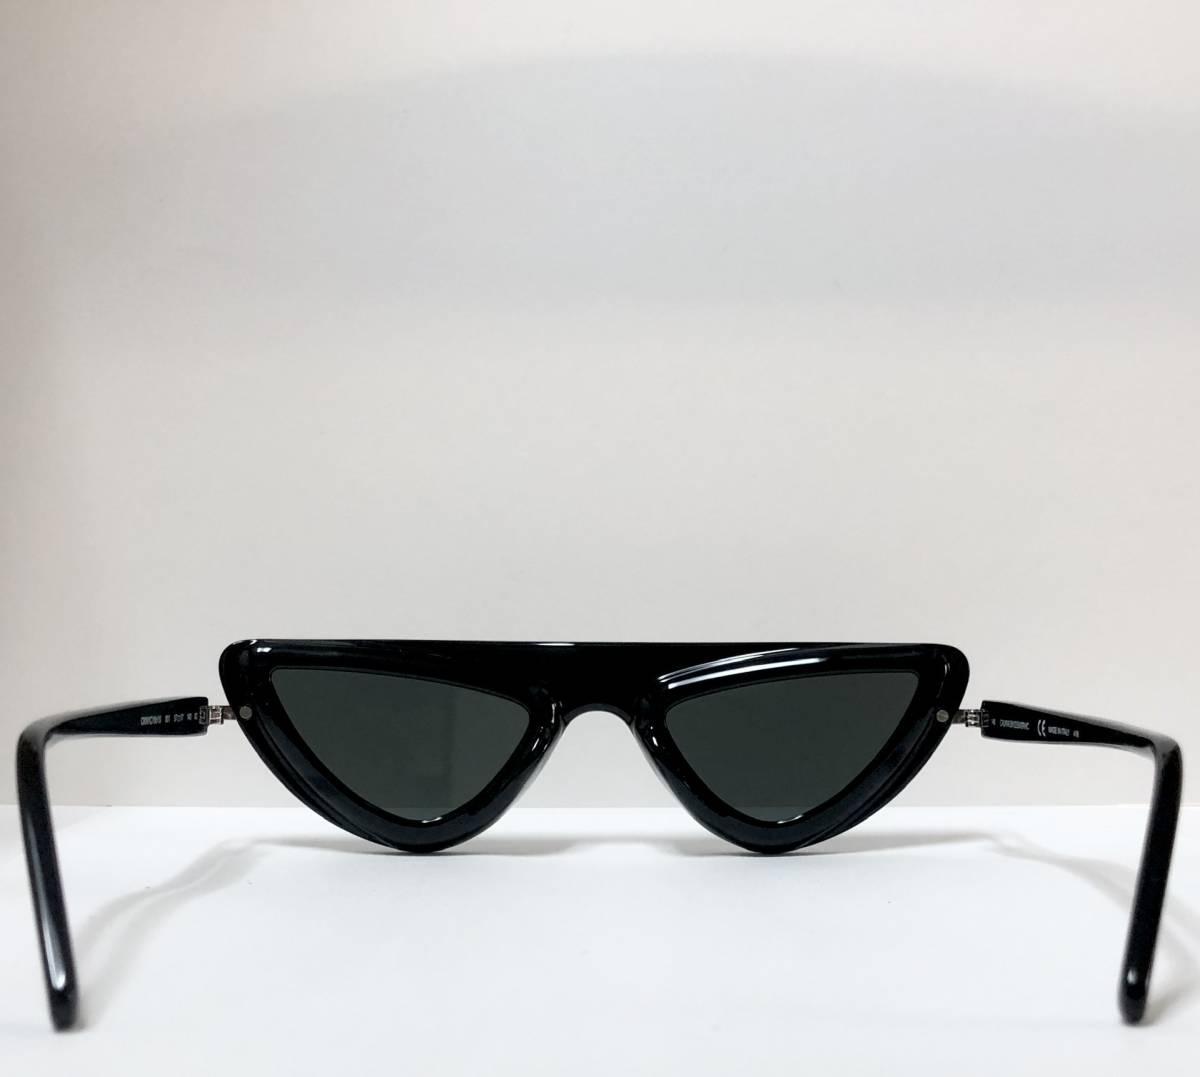 CK カルバンクライン 芸術的なサングラス イタリア製 純正・新品 ケース付き 米国ブランド Calvin Klein メガネ可能_画像7